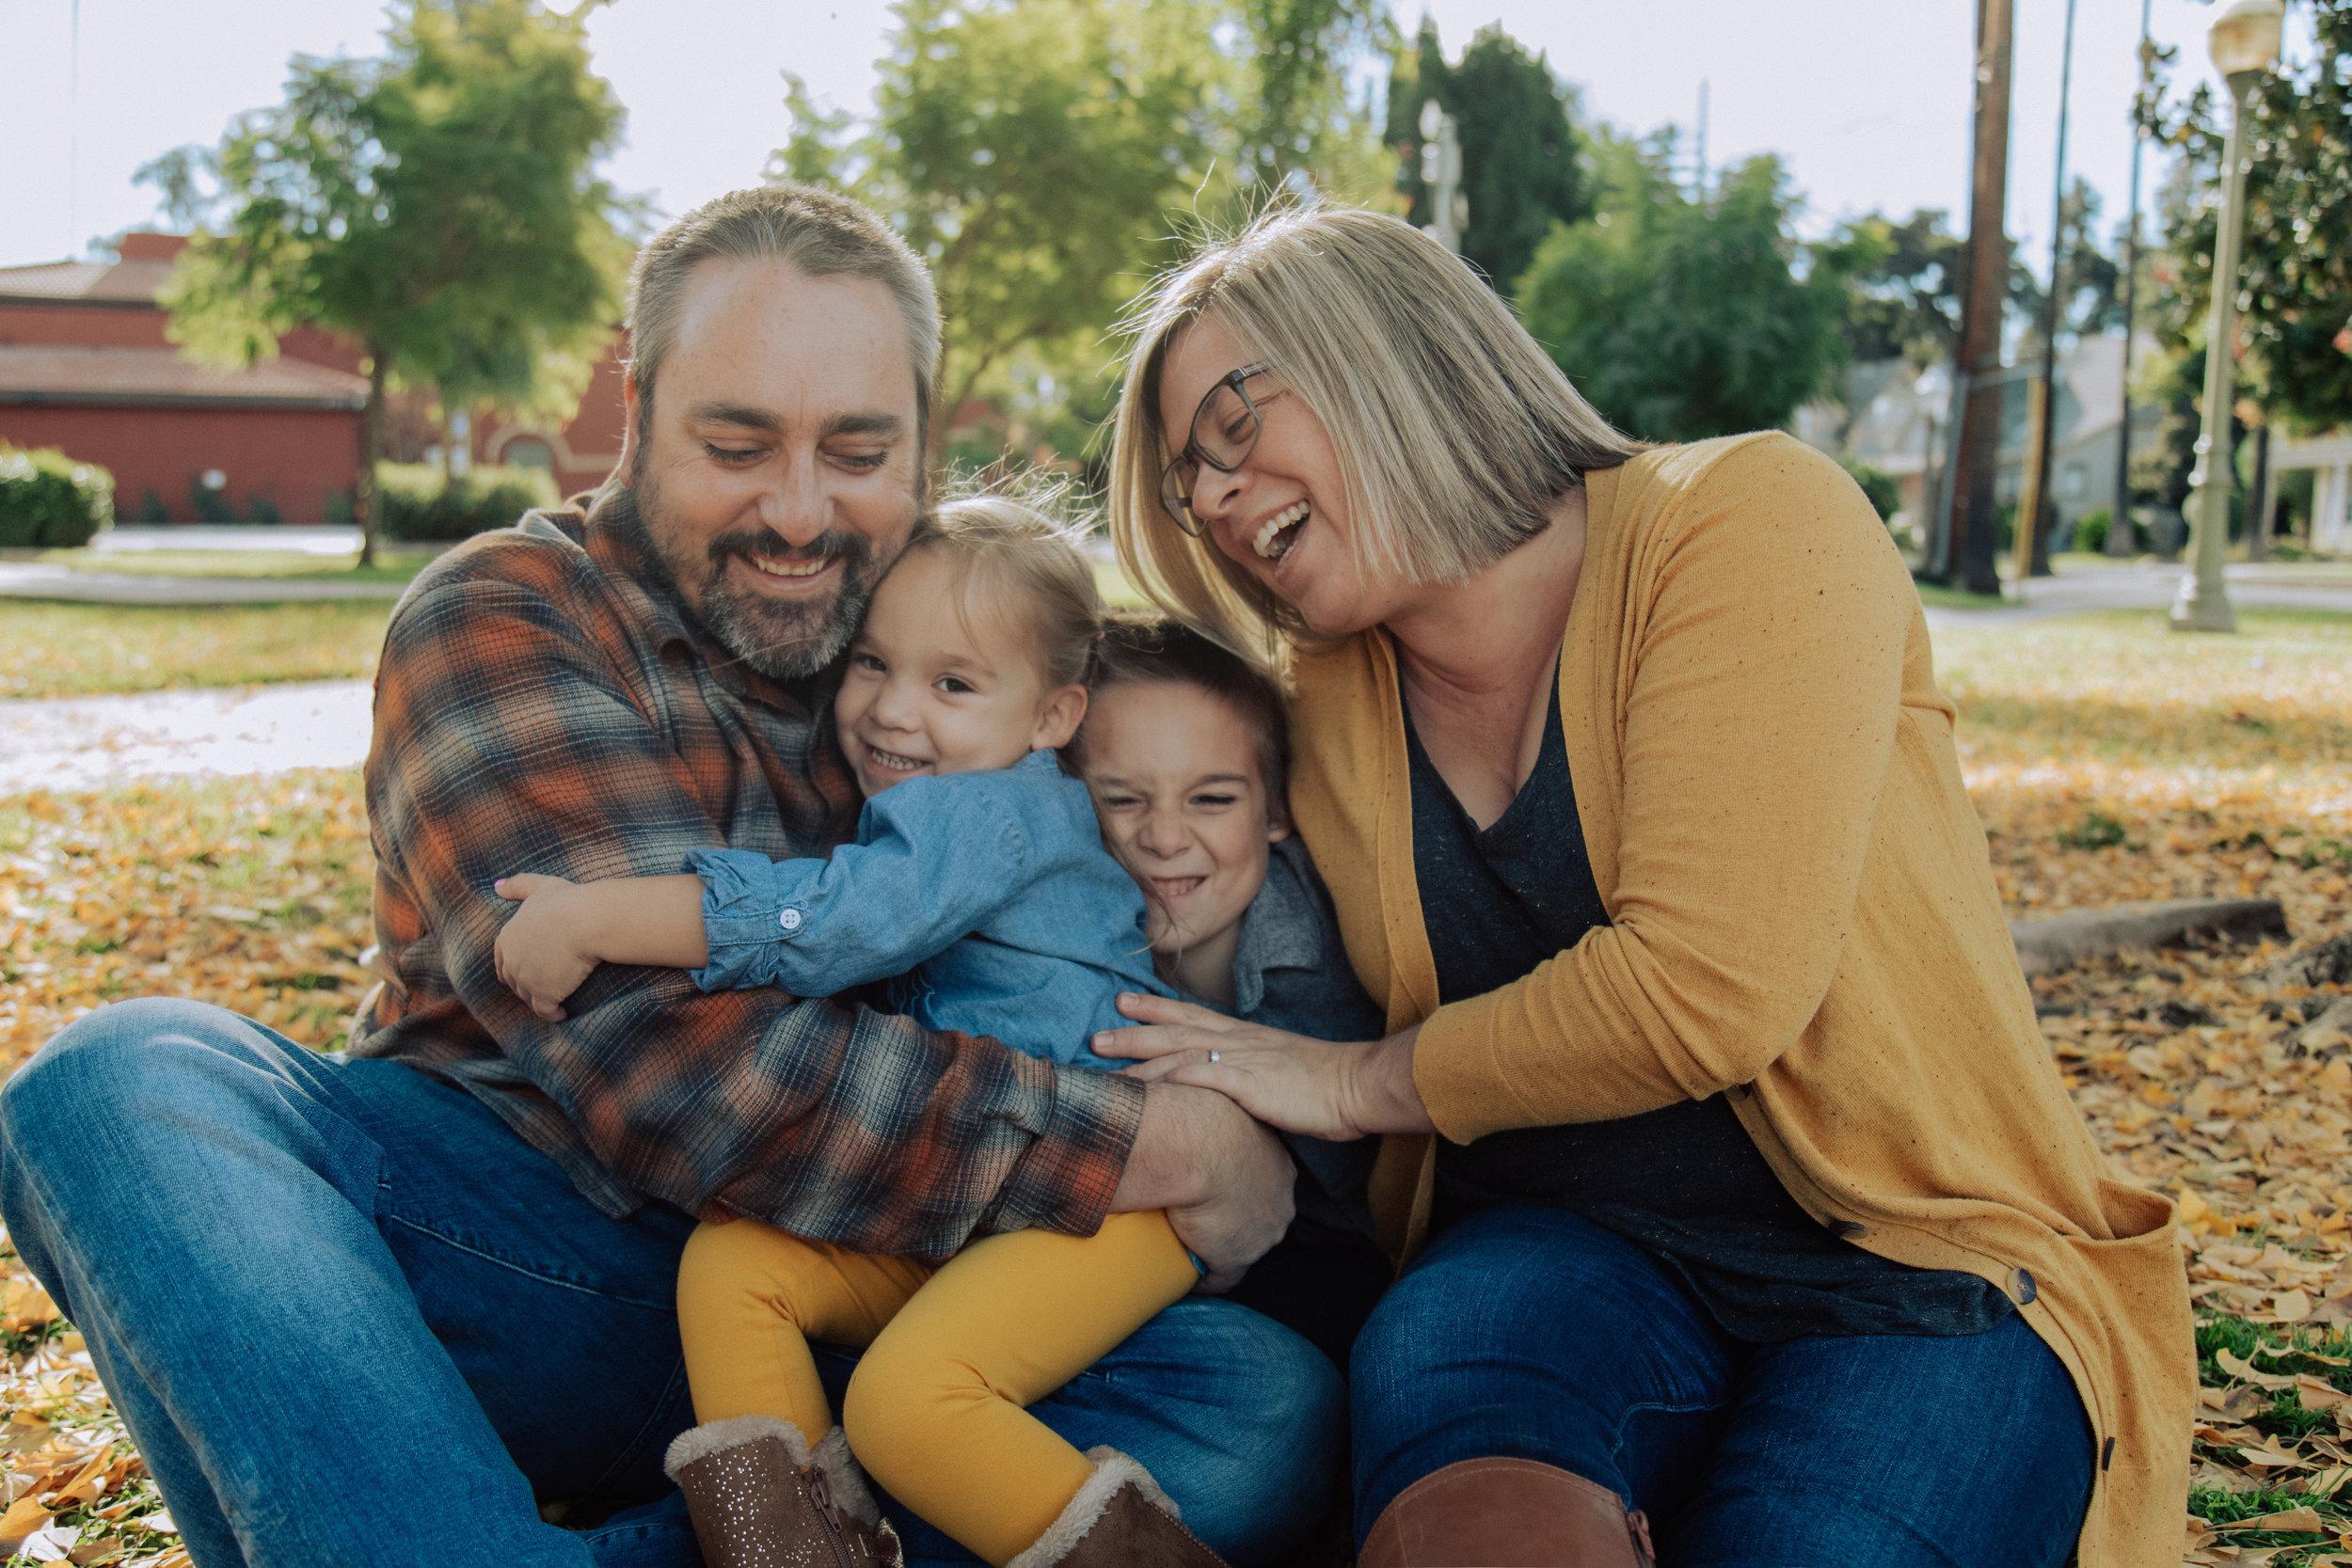 Baker Family - Downtown Redlands, CA.